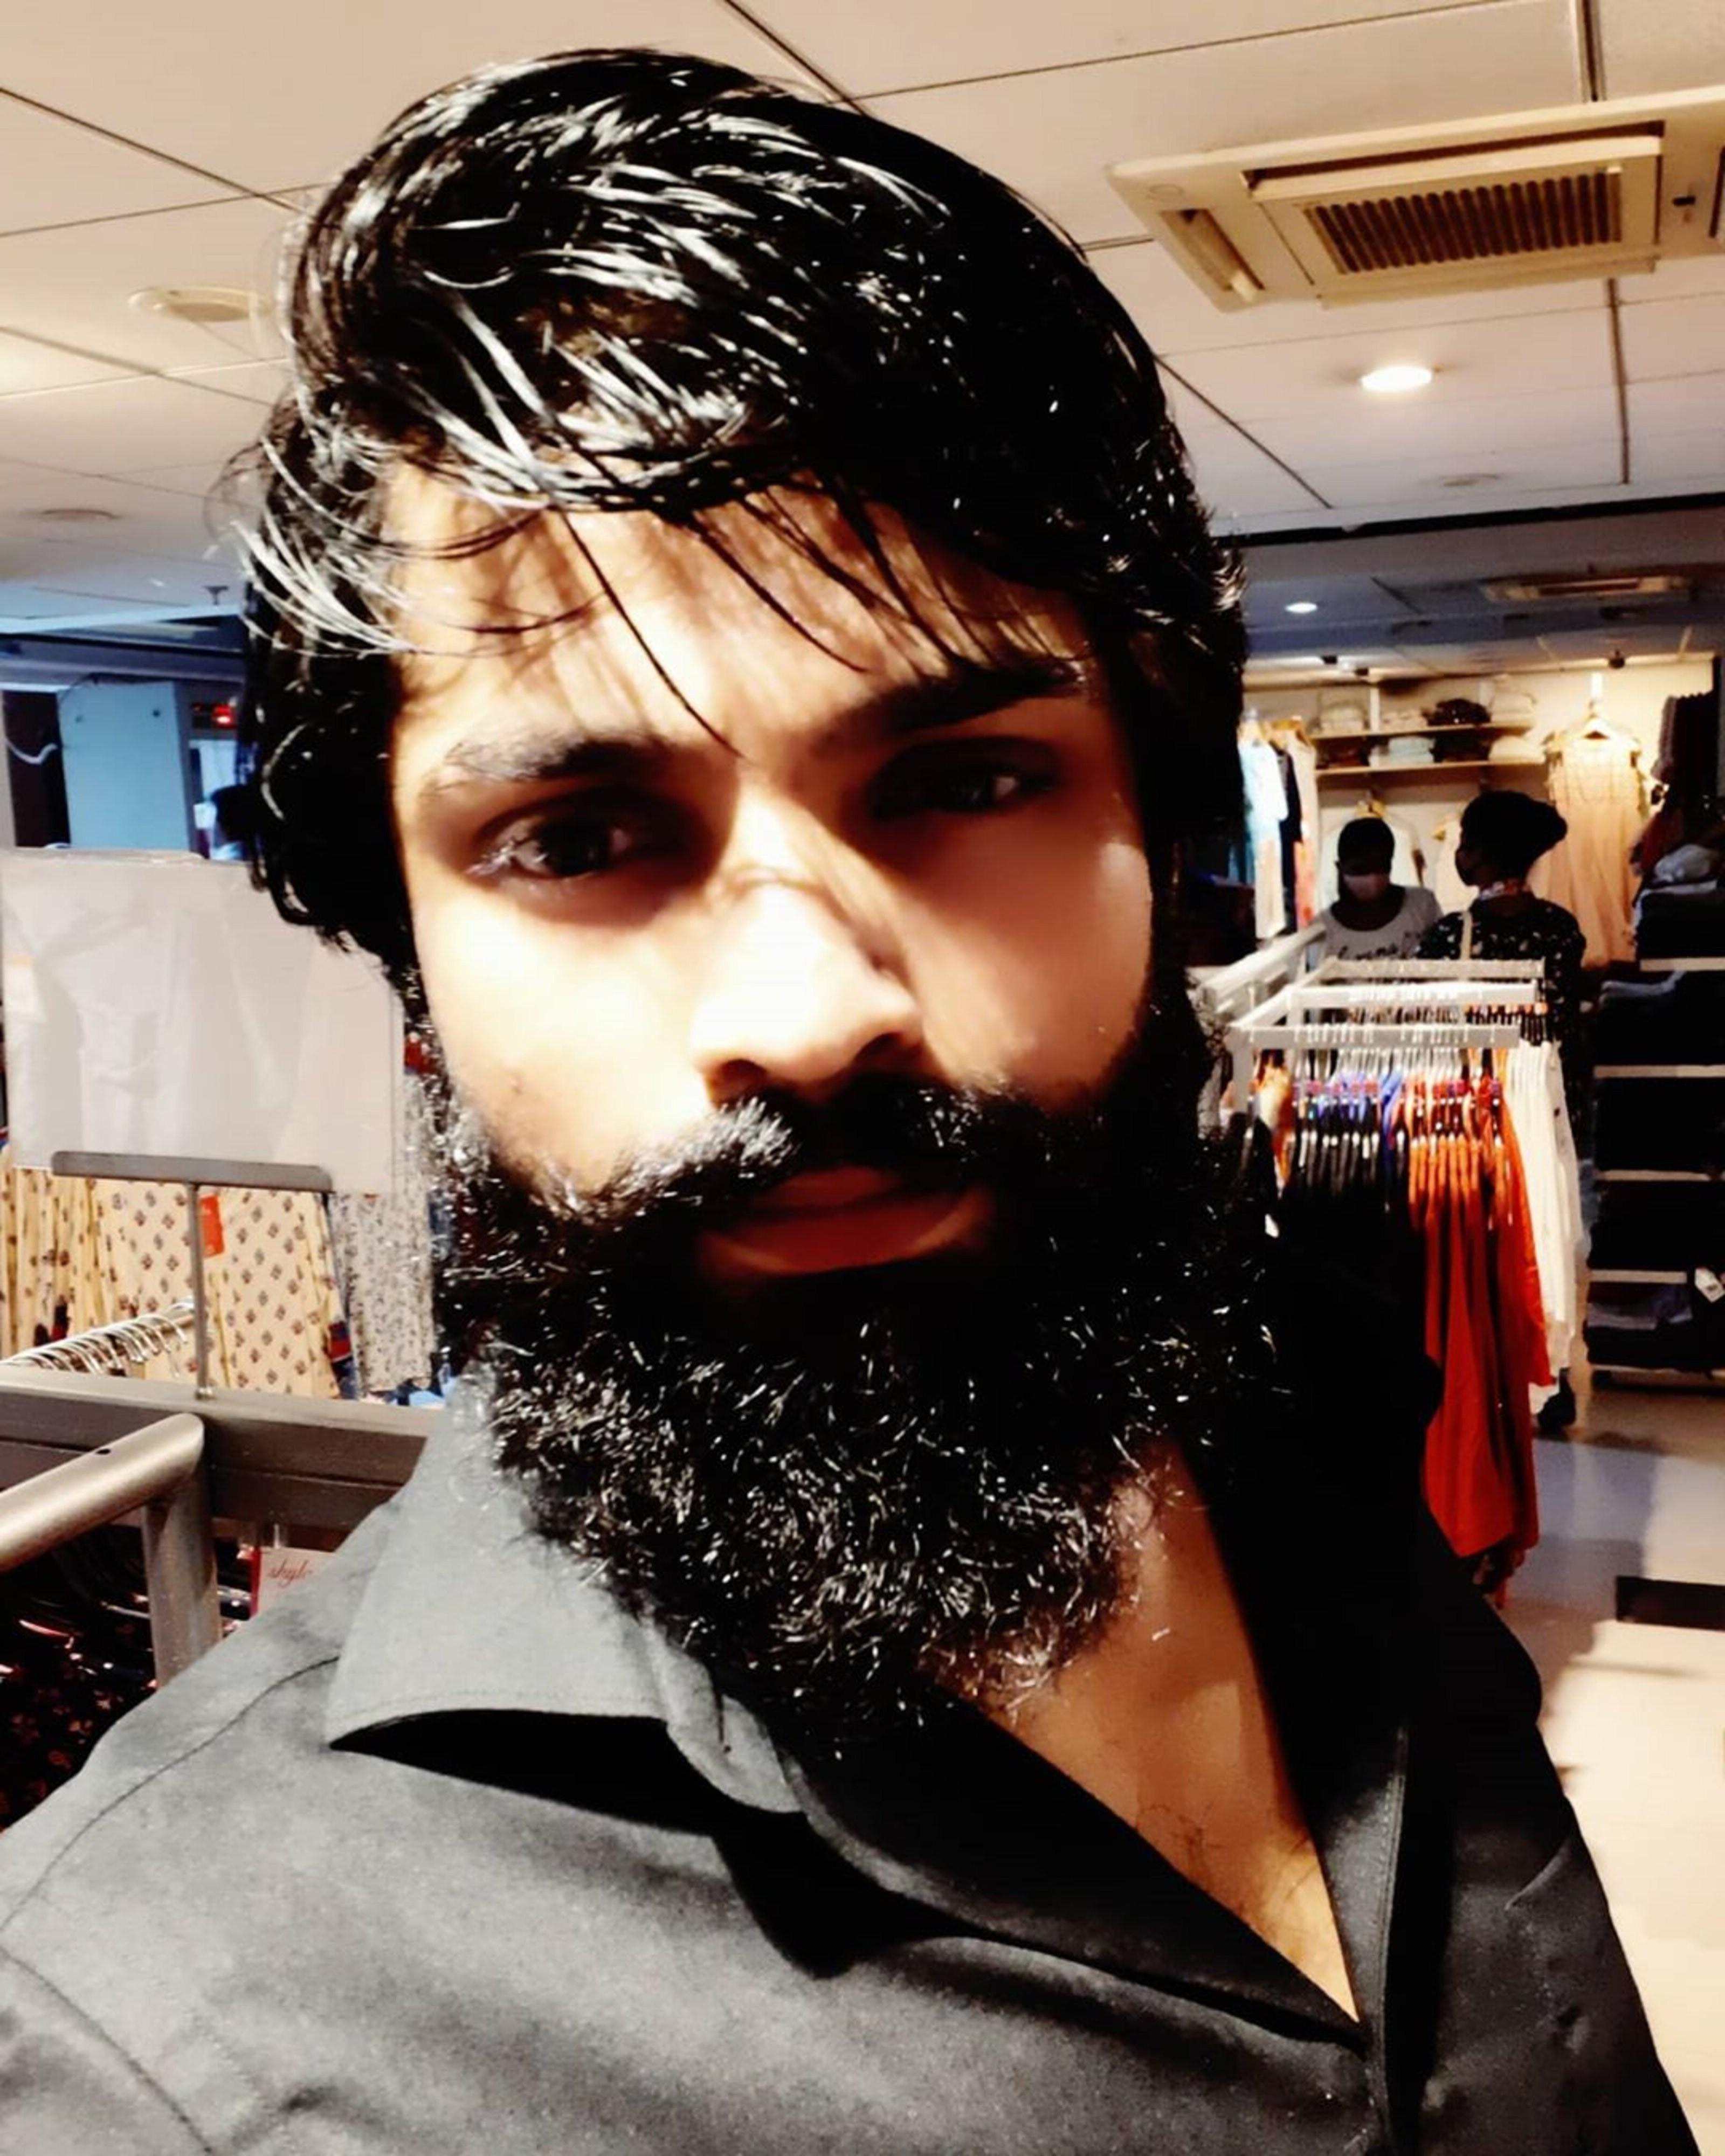 A long curled beard style.